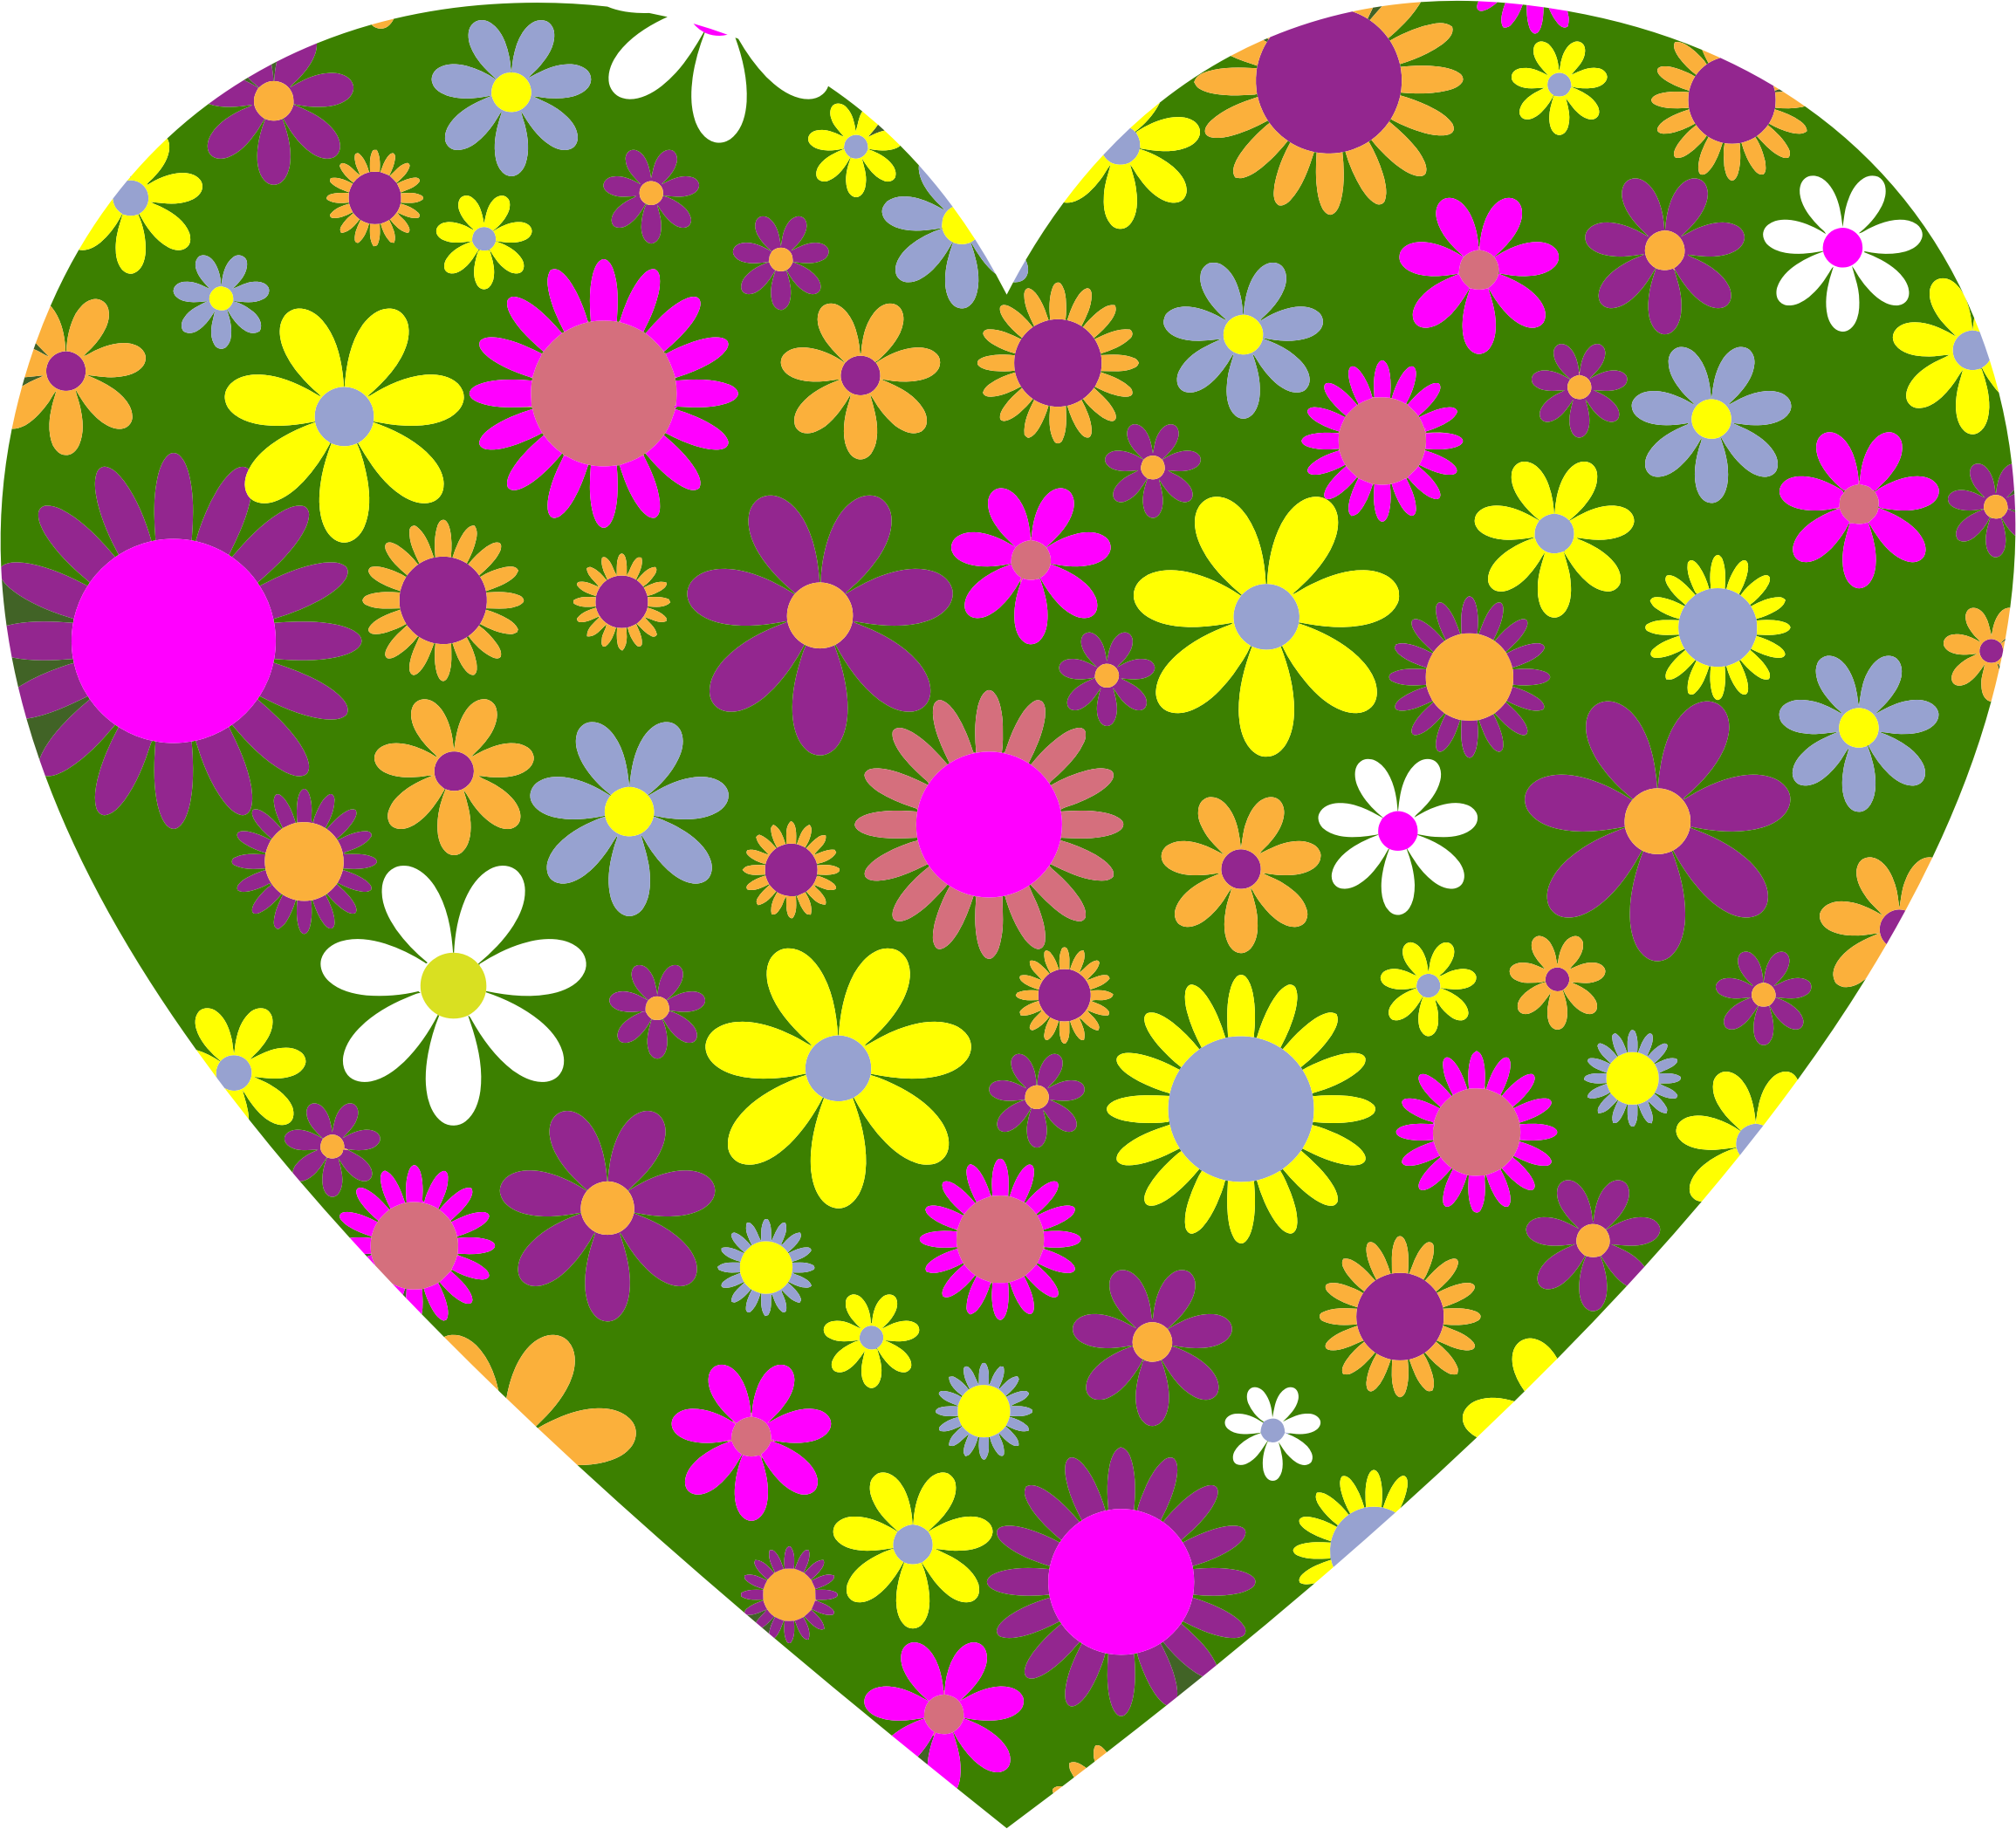 Retro clipart heart. Floral big image png